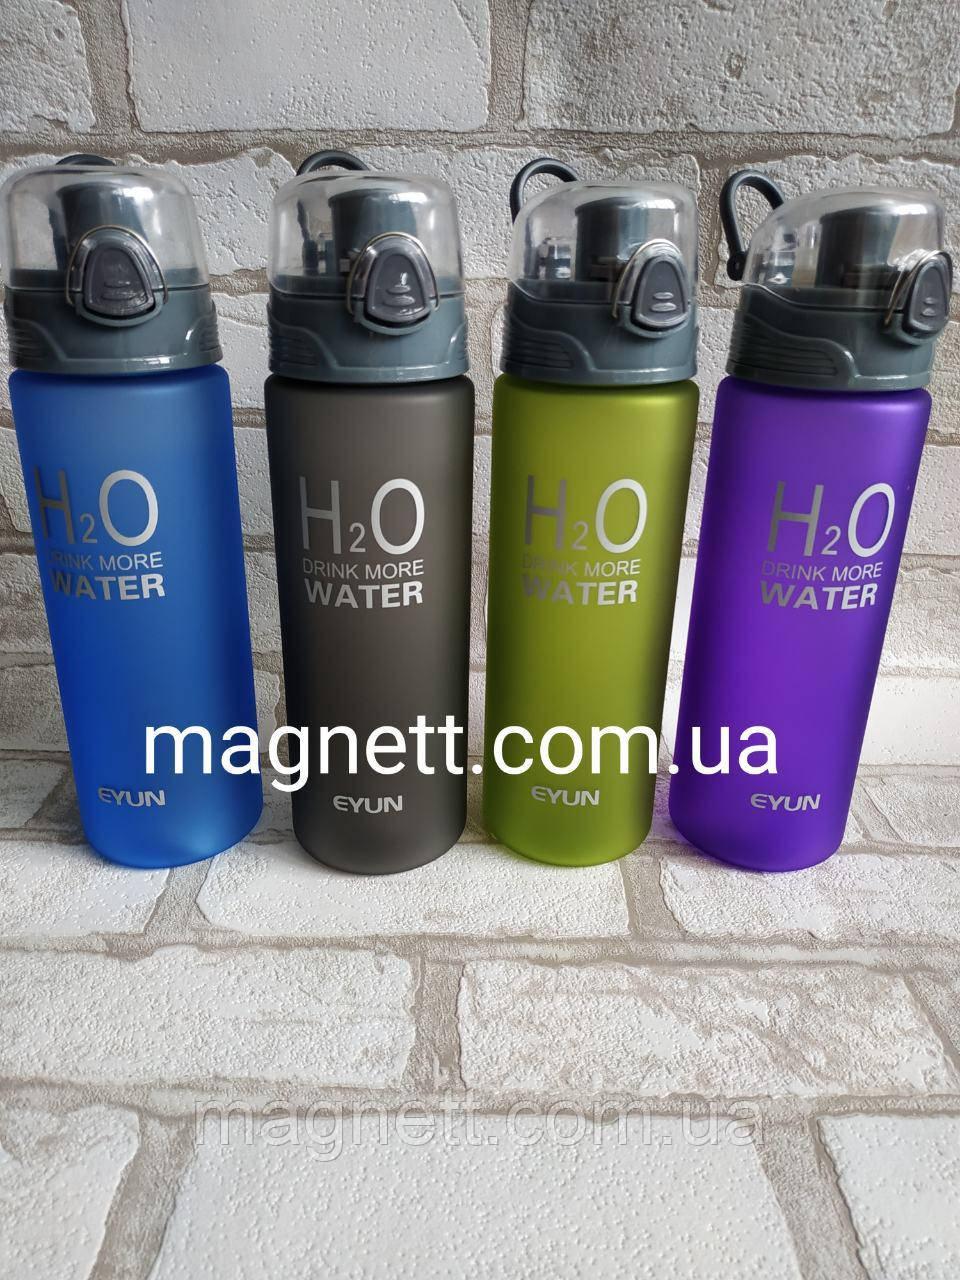 Фитнес бутылка H2O Drink more Water  750мл